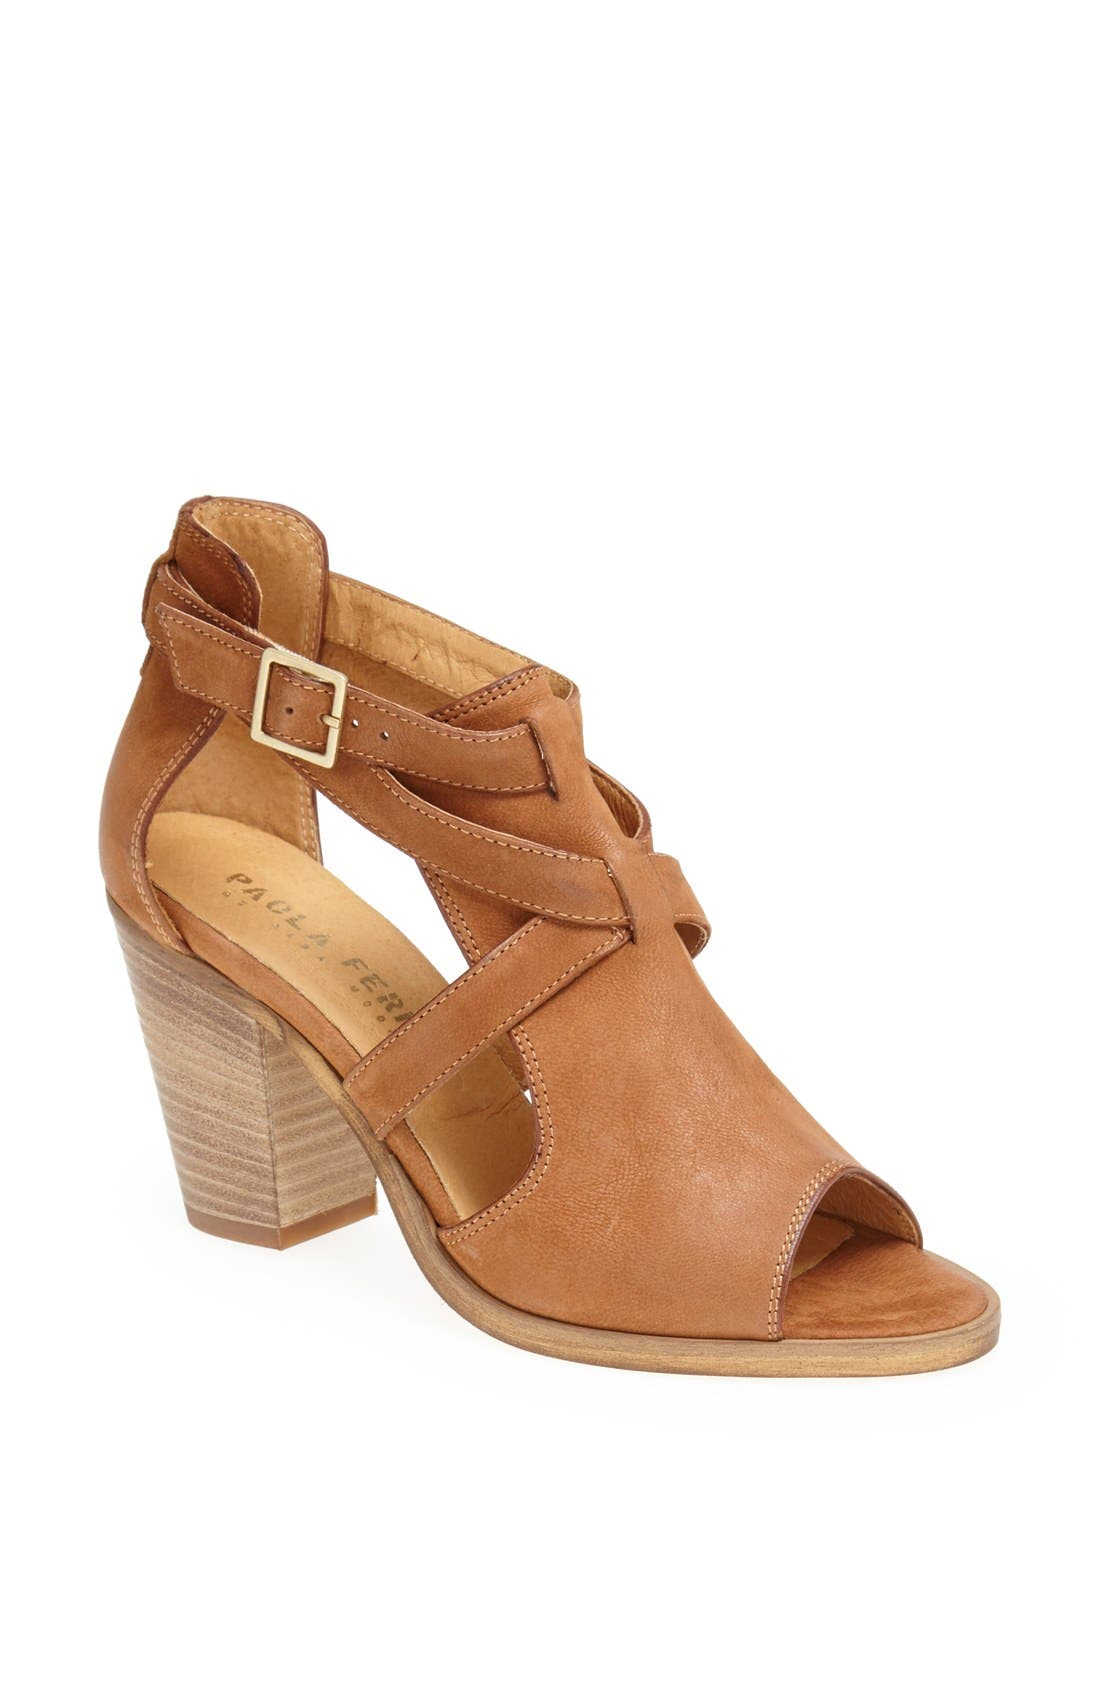 Alternate Image 1 Selected - Paola Ferri Leather Sandal